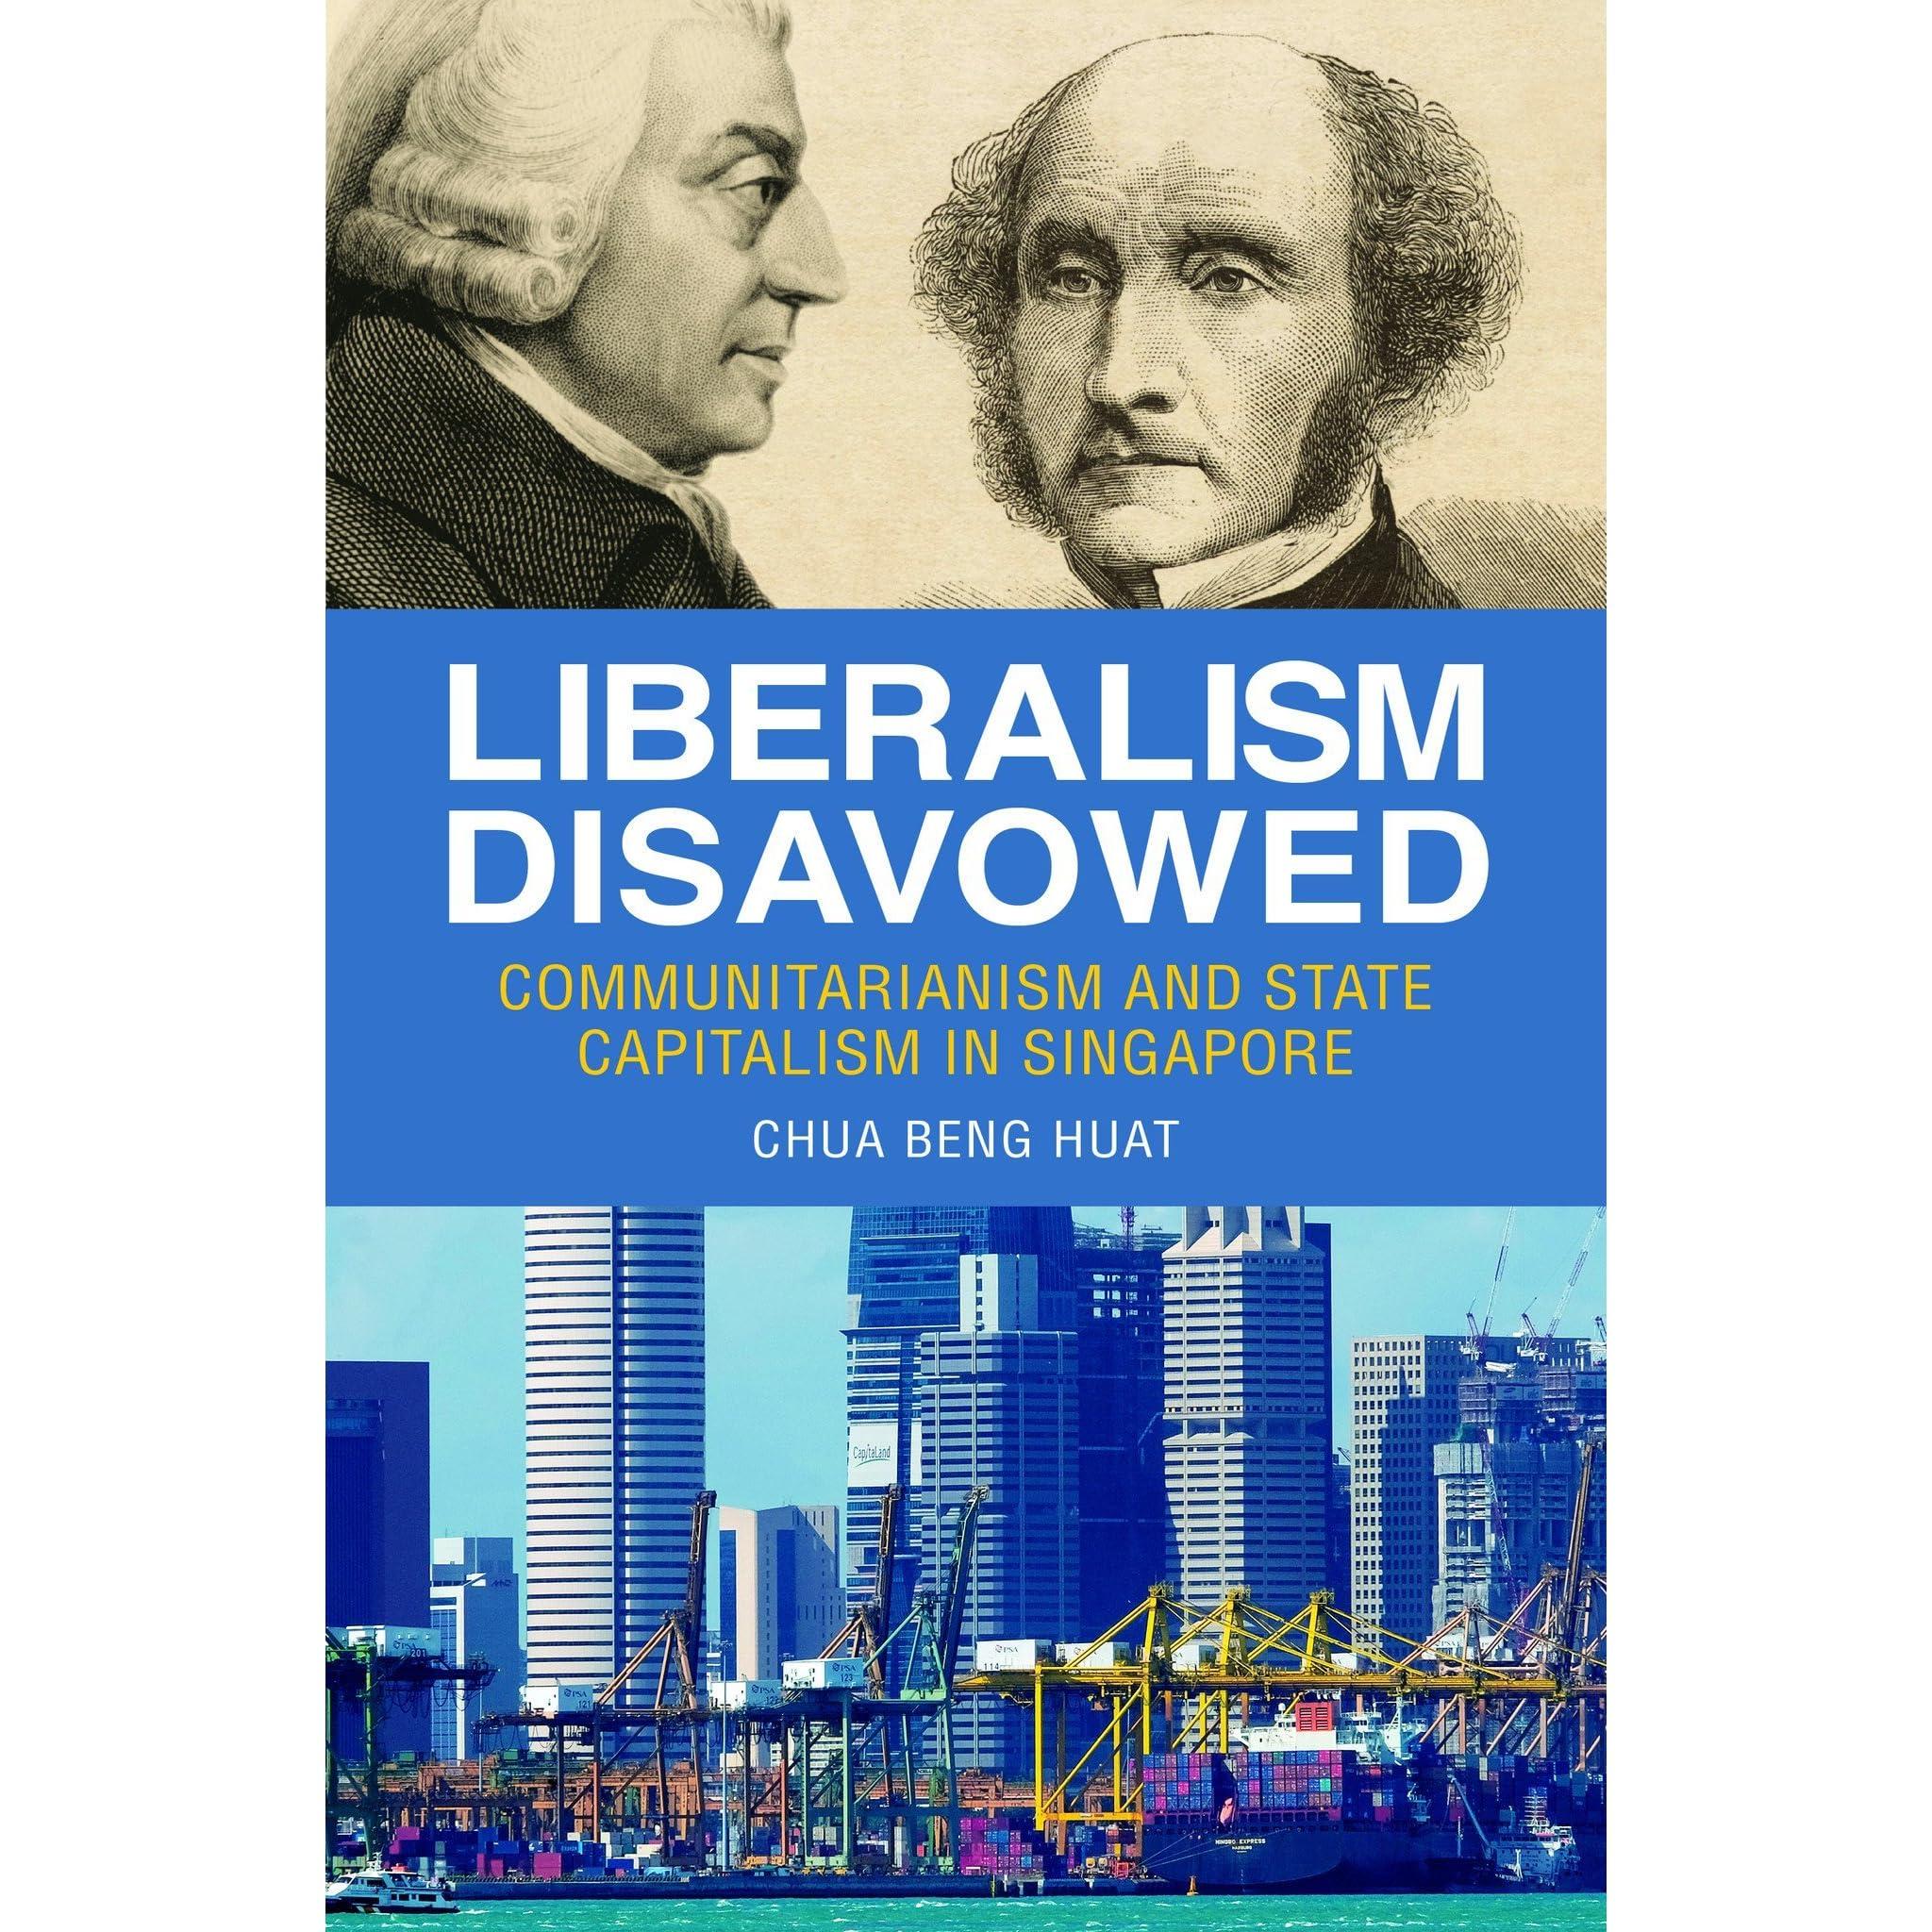 communitarian ideology and democracy in singapore chua beng huat